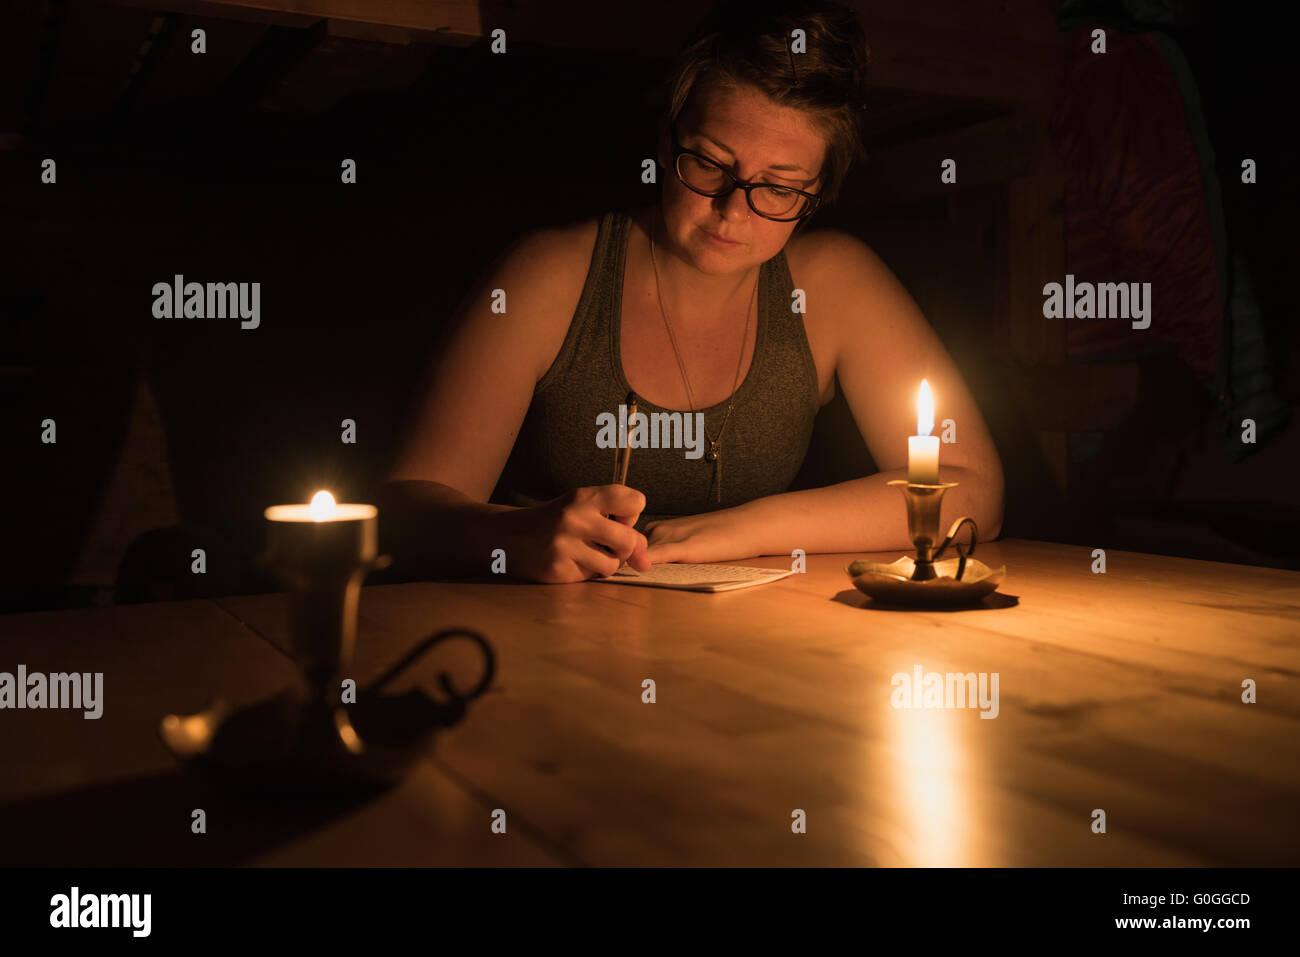 Female hiker writes in journal by candlelight at Abiskojaure hut, Kungsleden trail, Lapland, Sweden - Stock Image